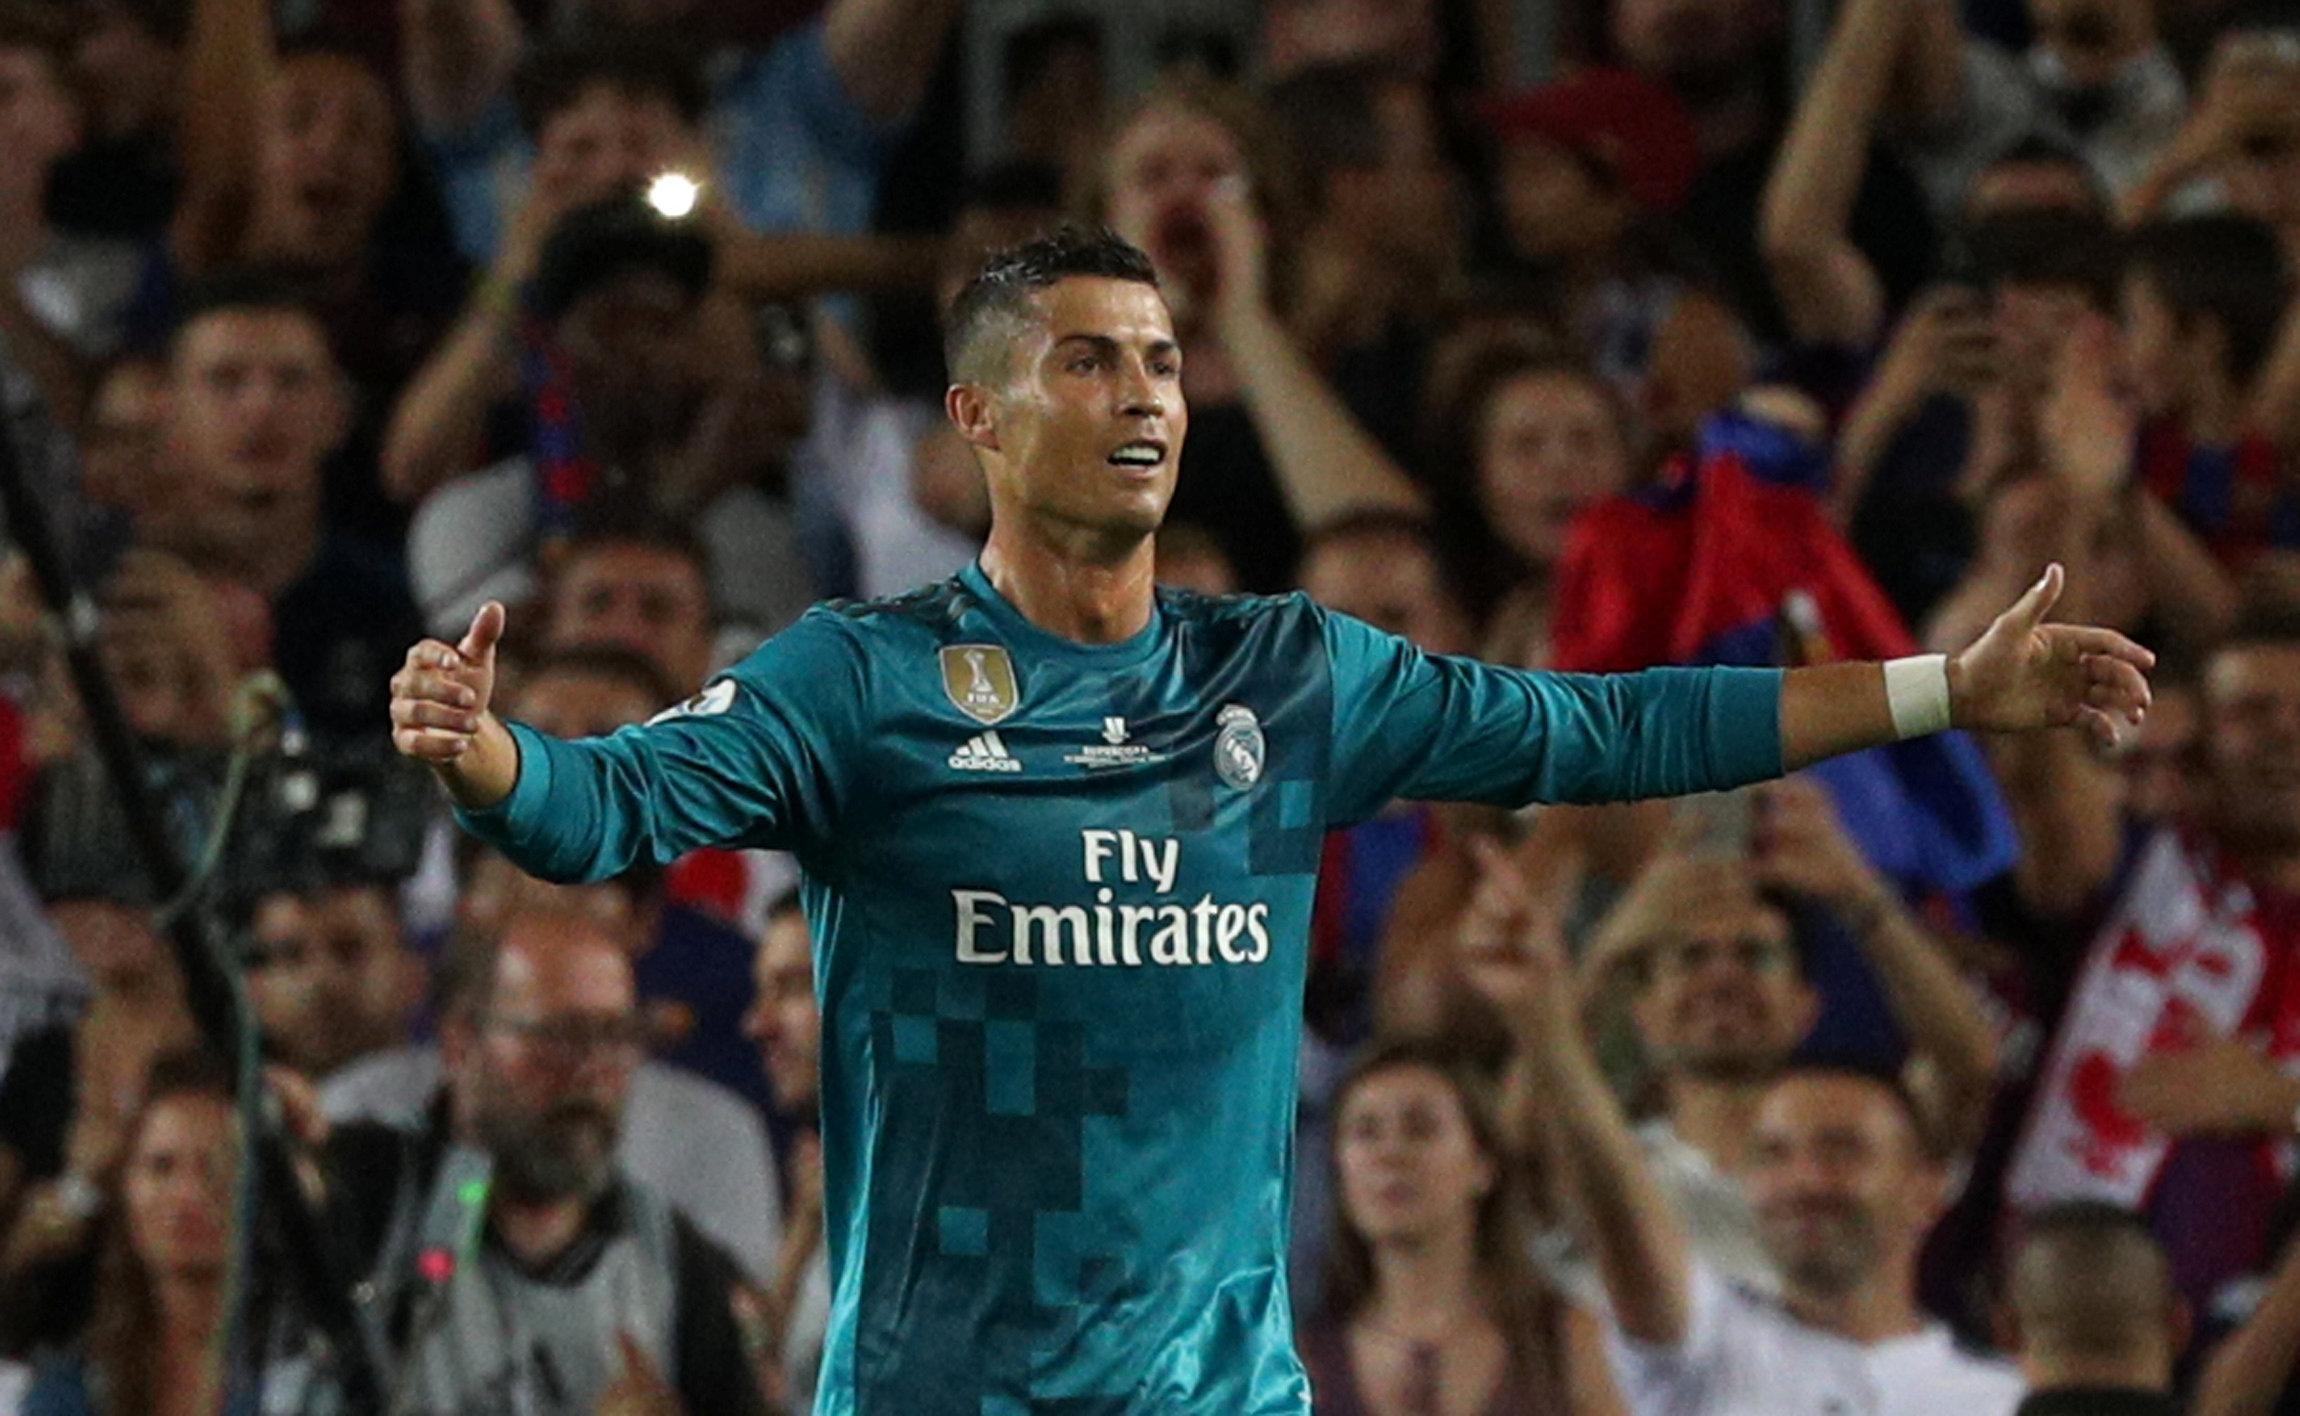 Football: Buffon, Messi and Ronaldo on UEFA player of the year shortlist